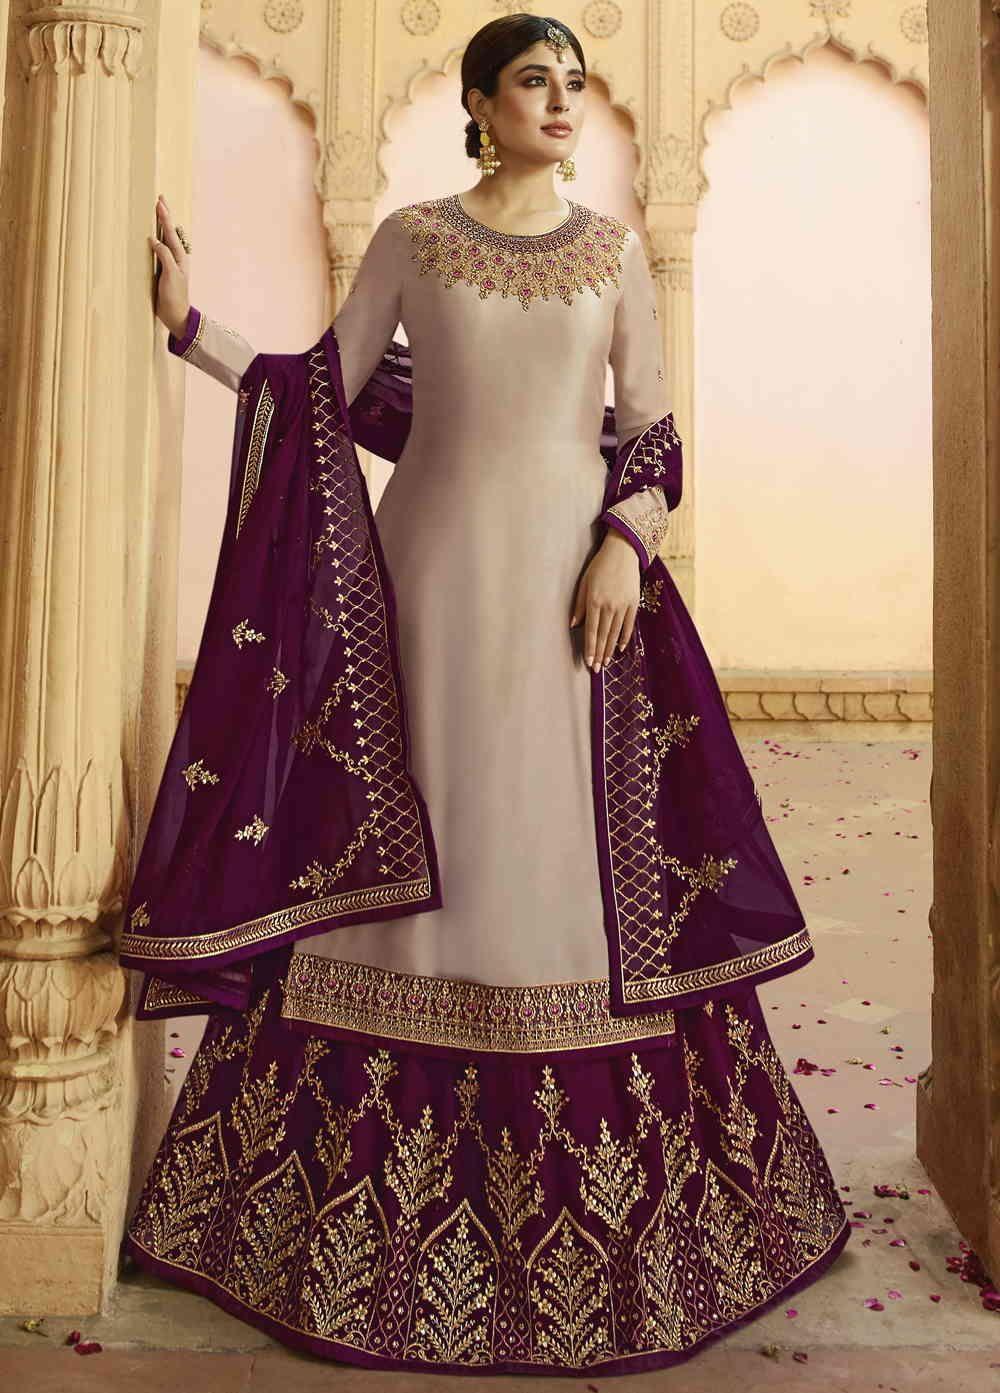 Buy Online Bewitching Chiku Party Wear Lehenga Style Suit Starring Kritika Kamra at reasonable ...